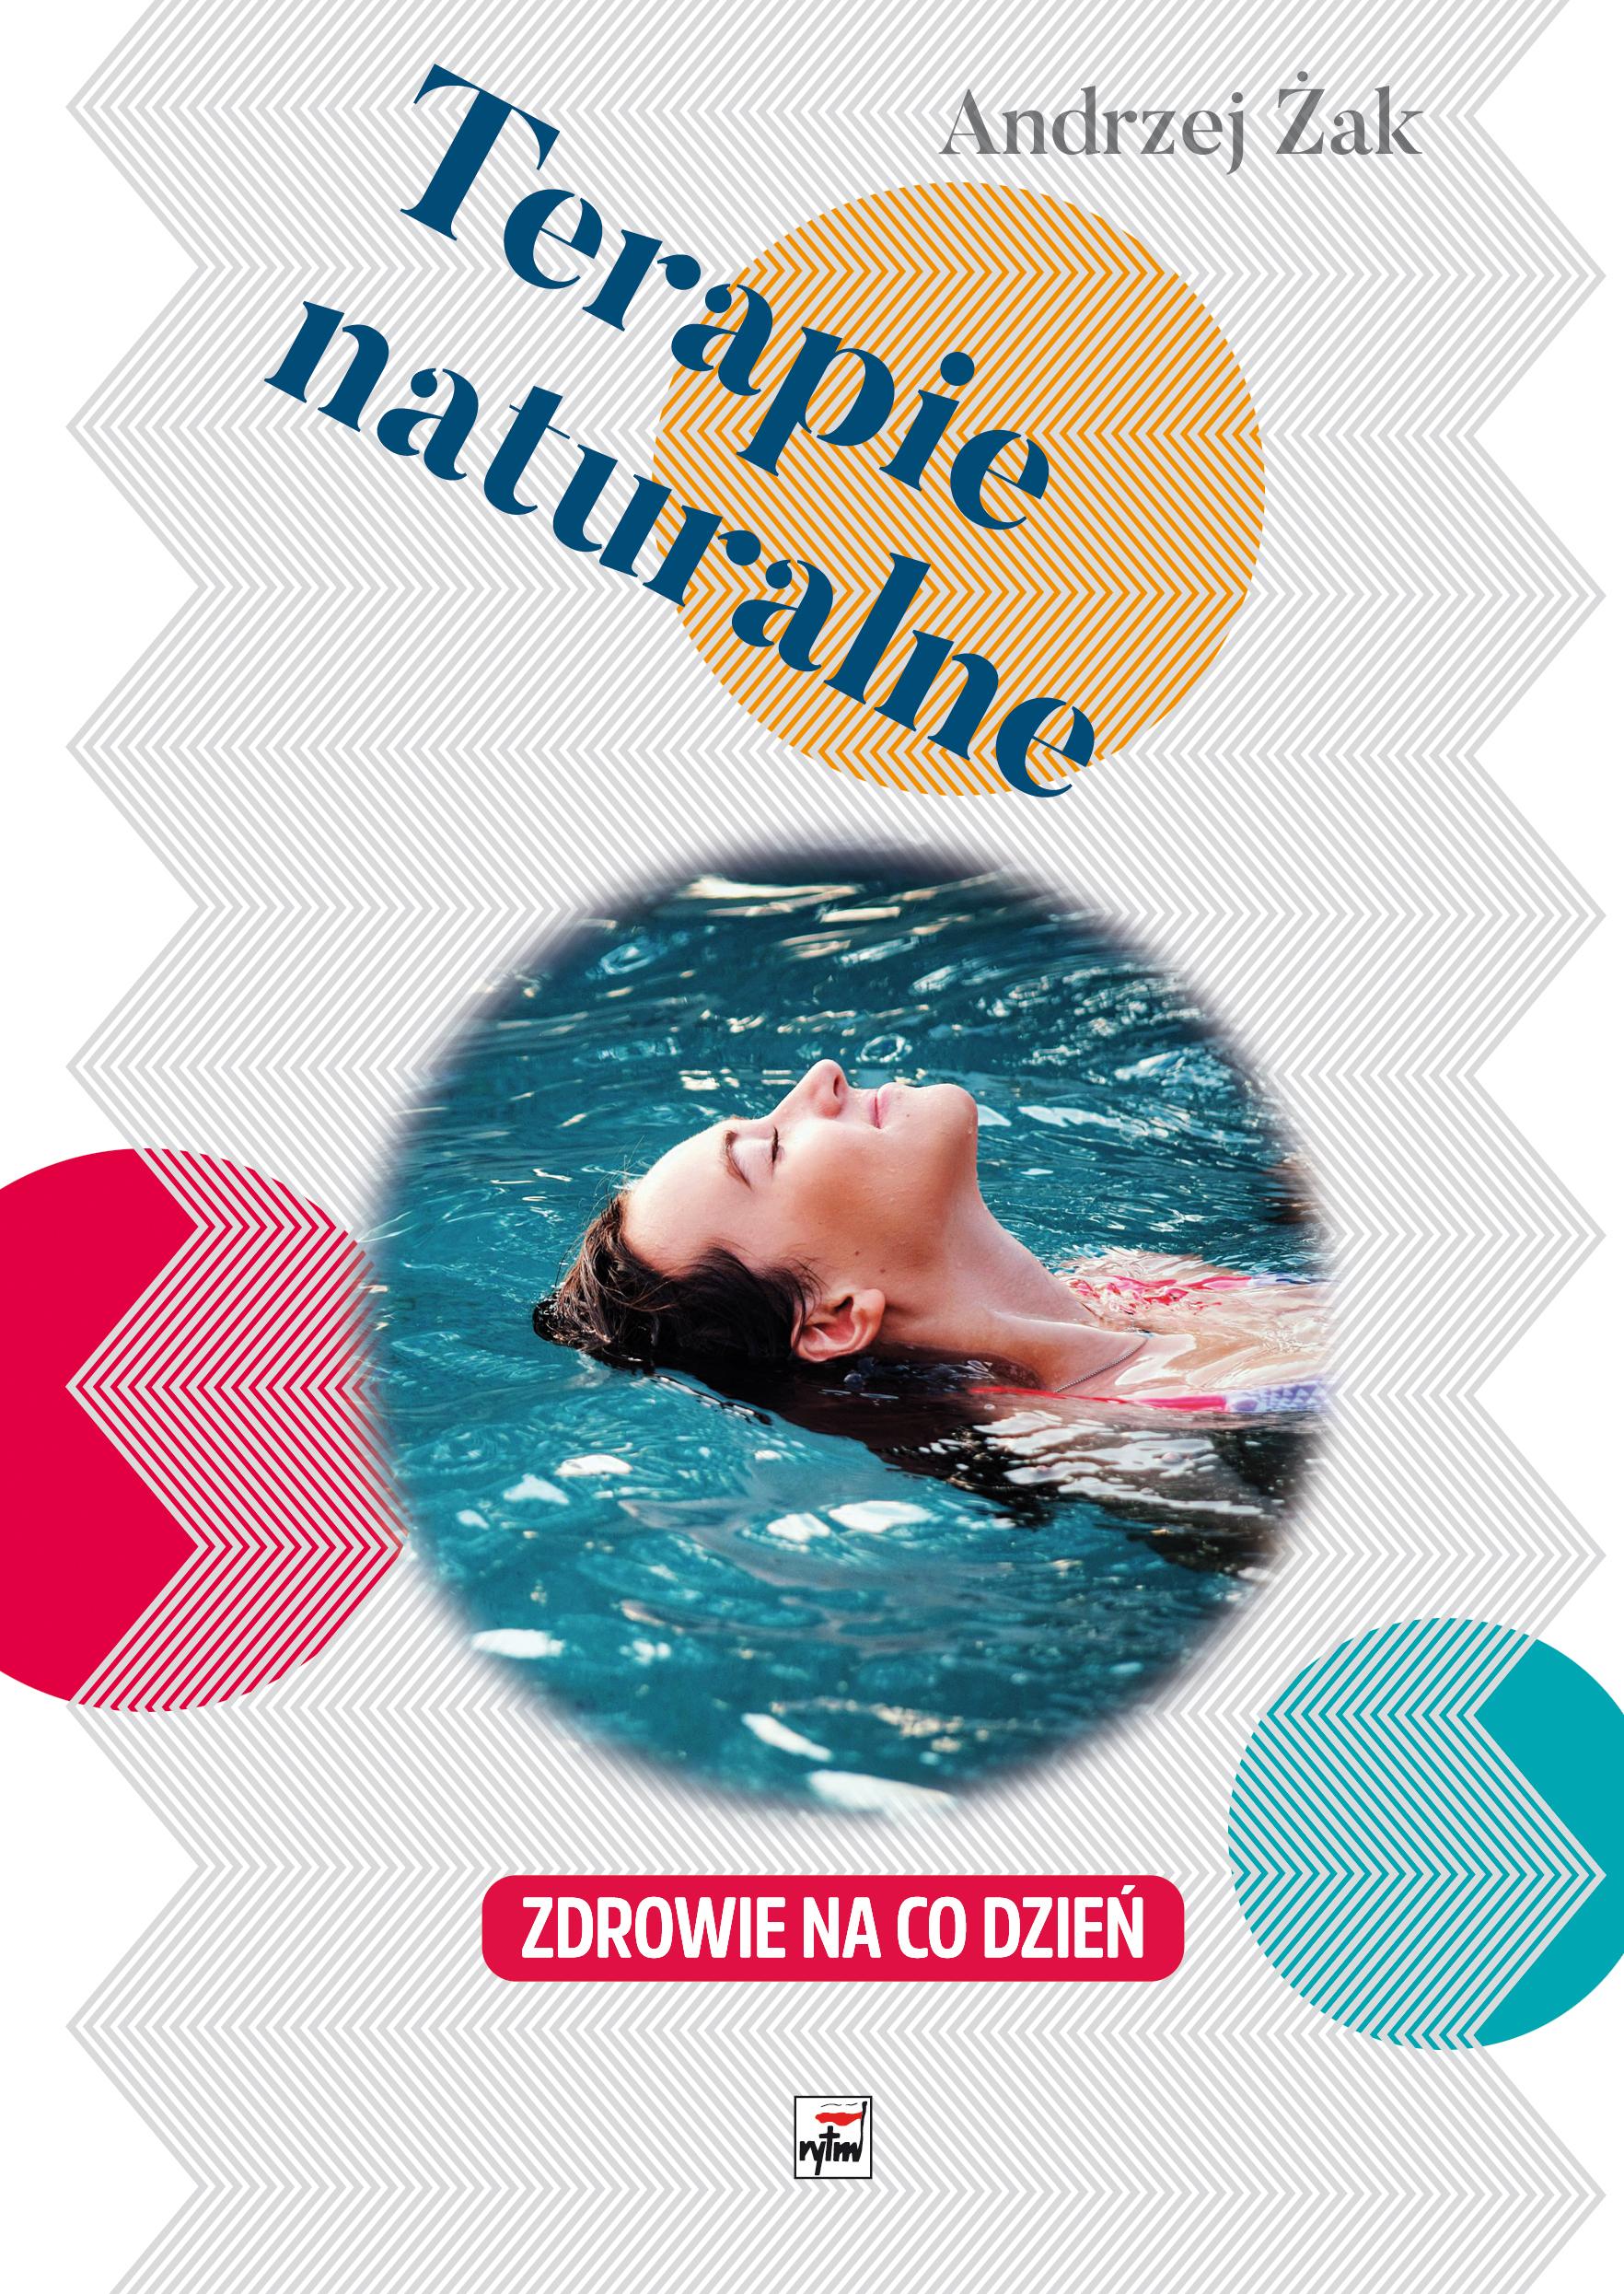 Terapie naturalne - Andrzej Żak